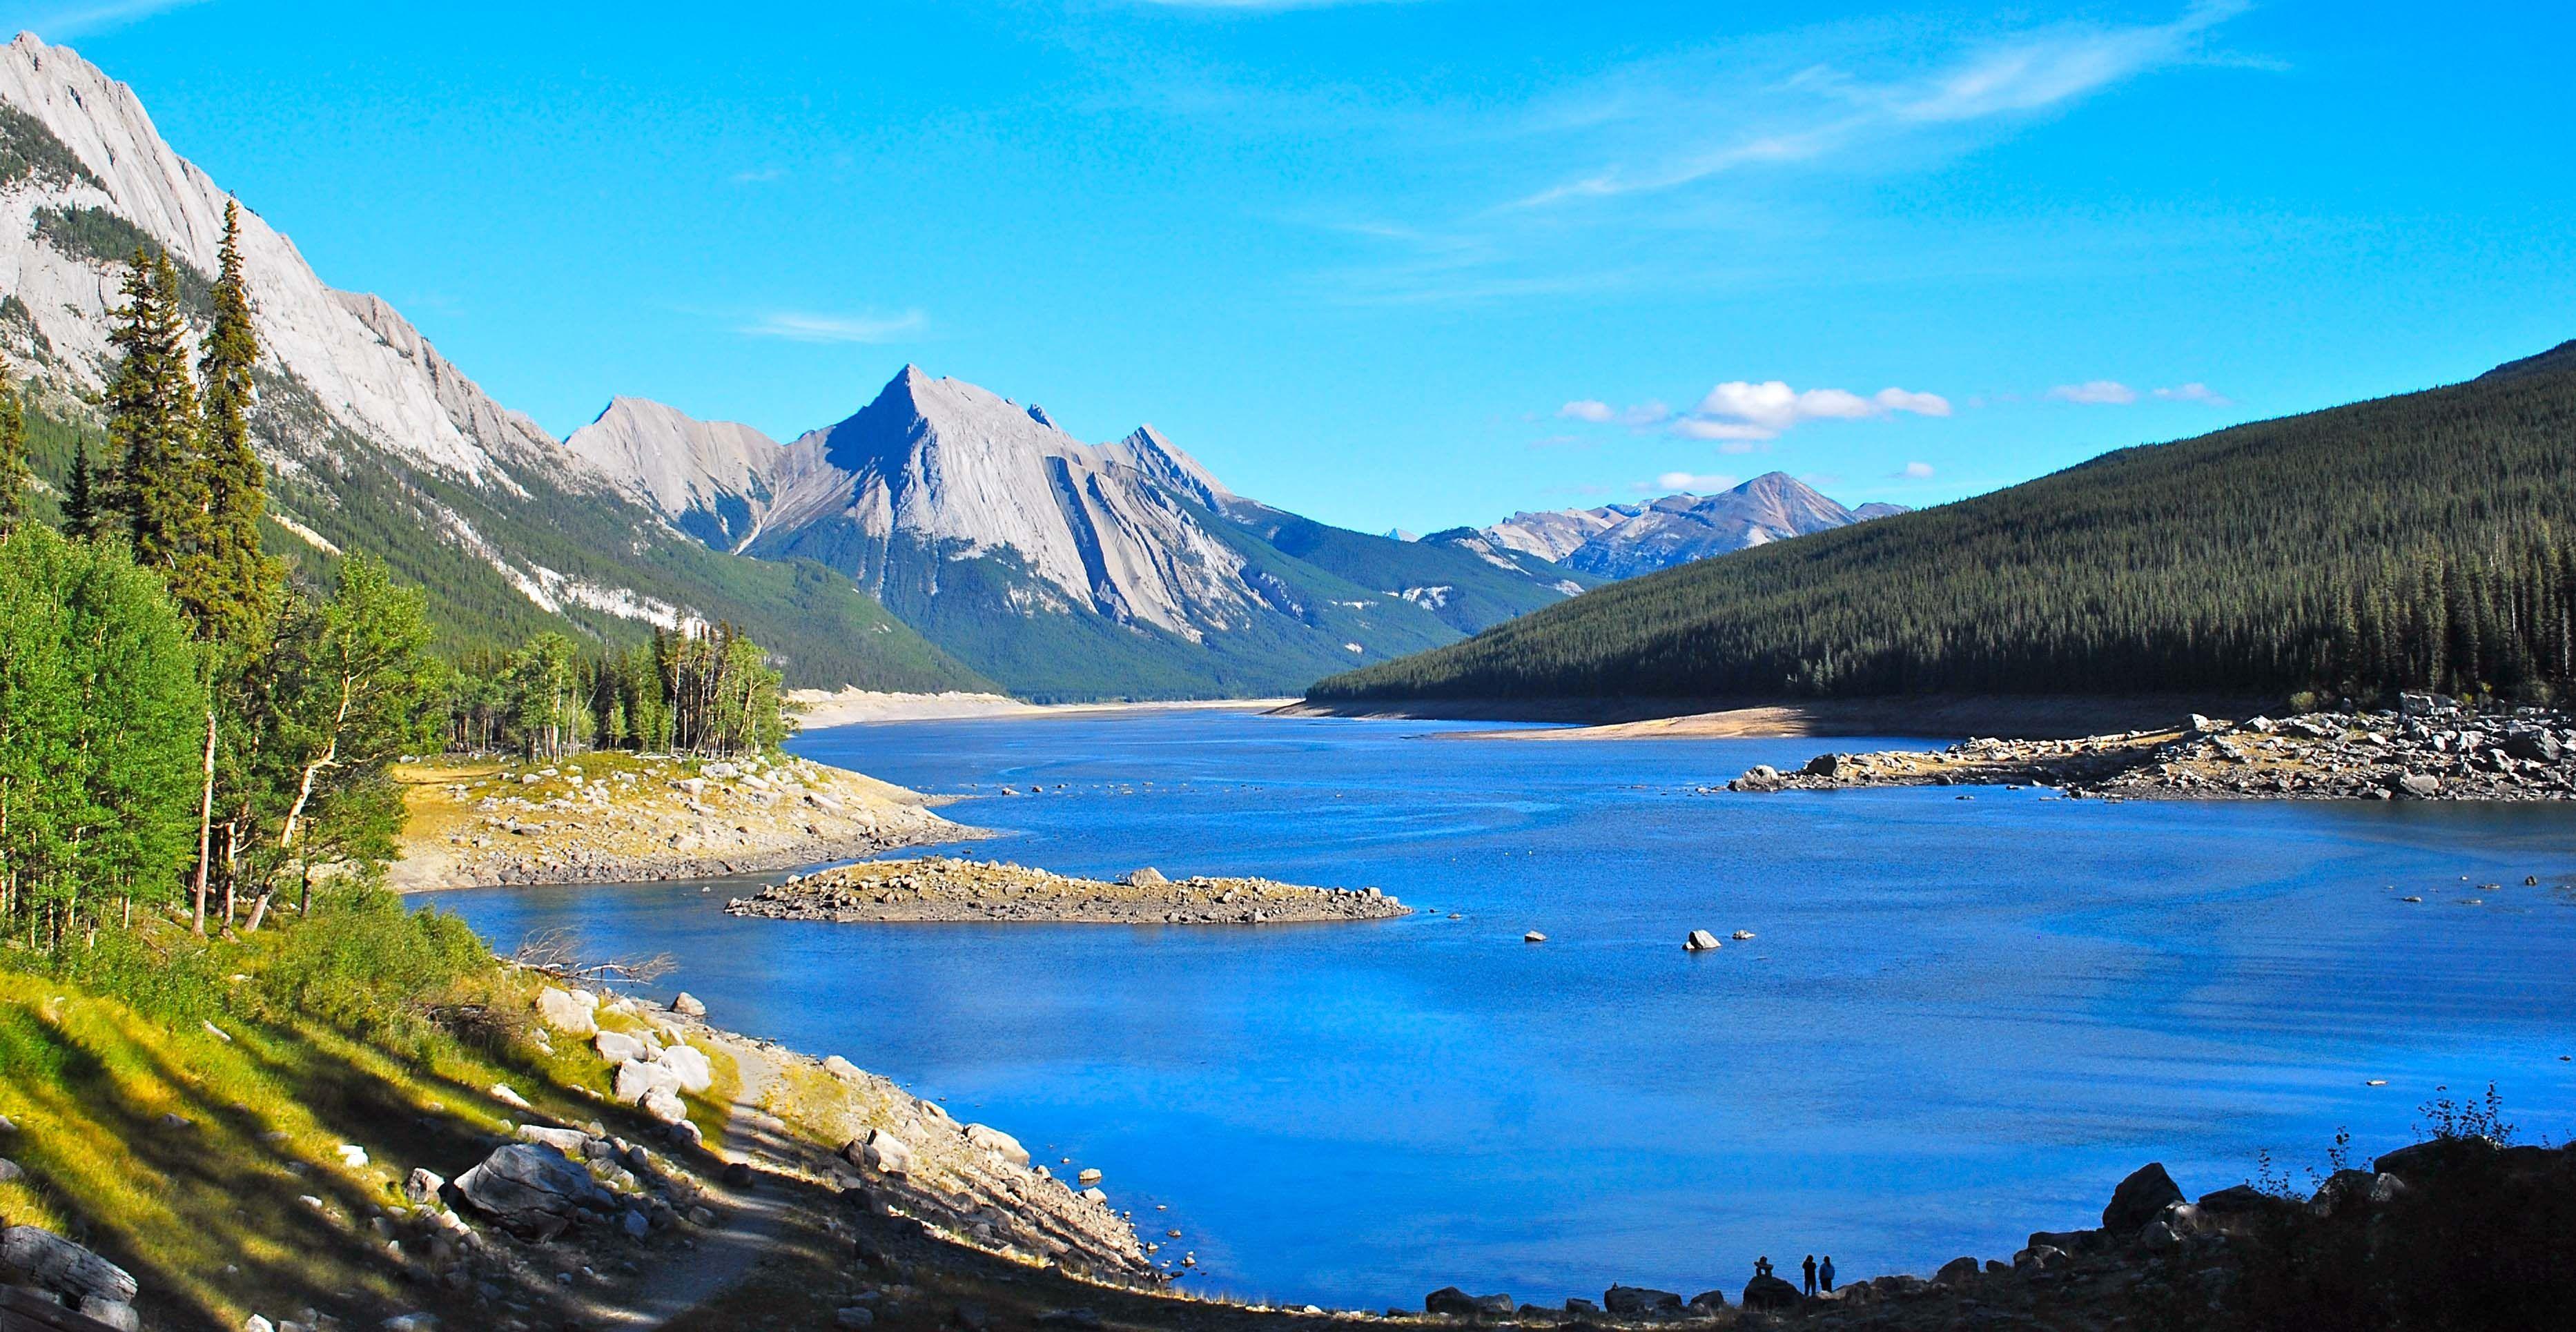 「medicine lake jasper」の画像検索結果